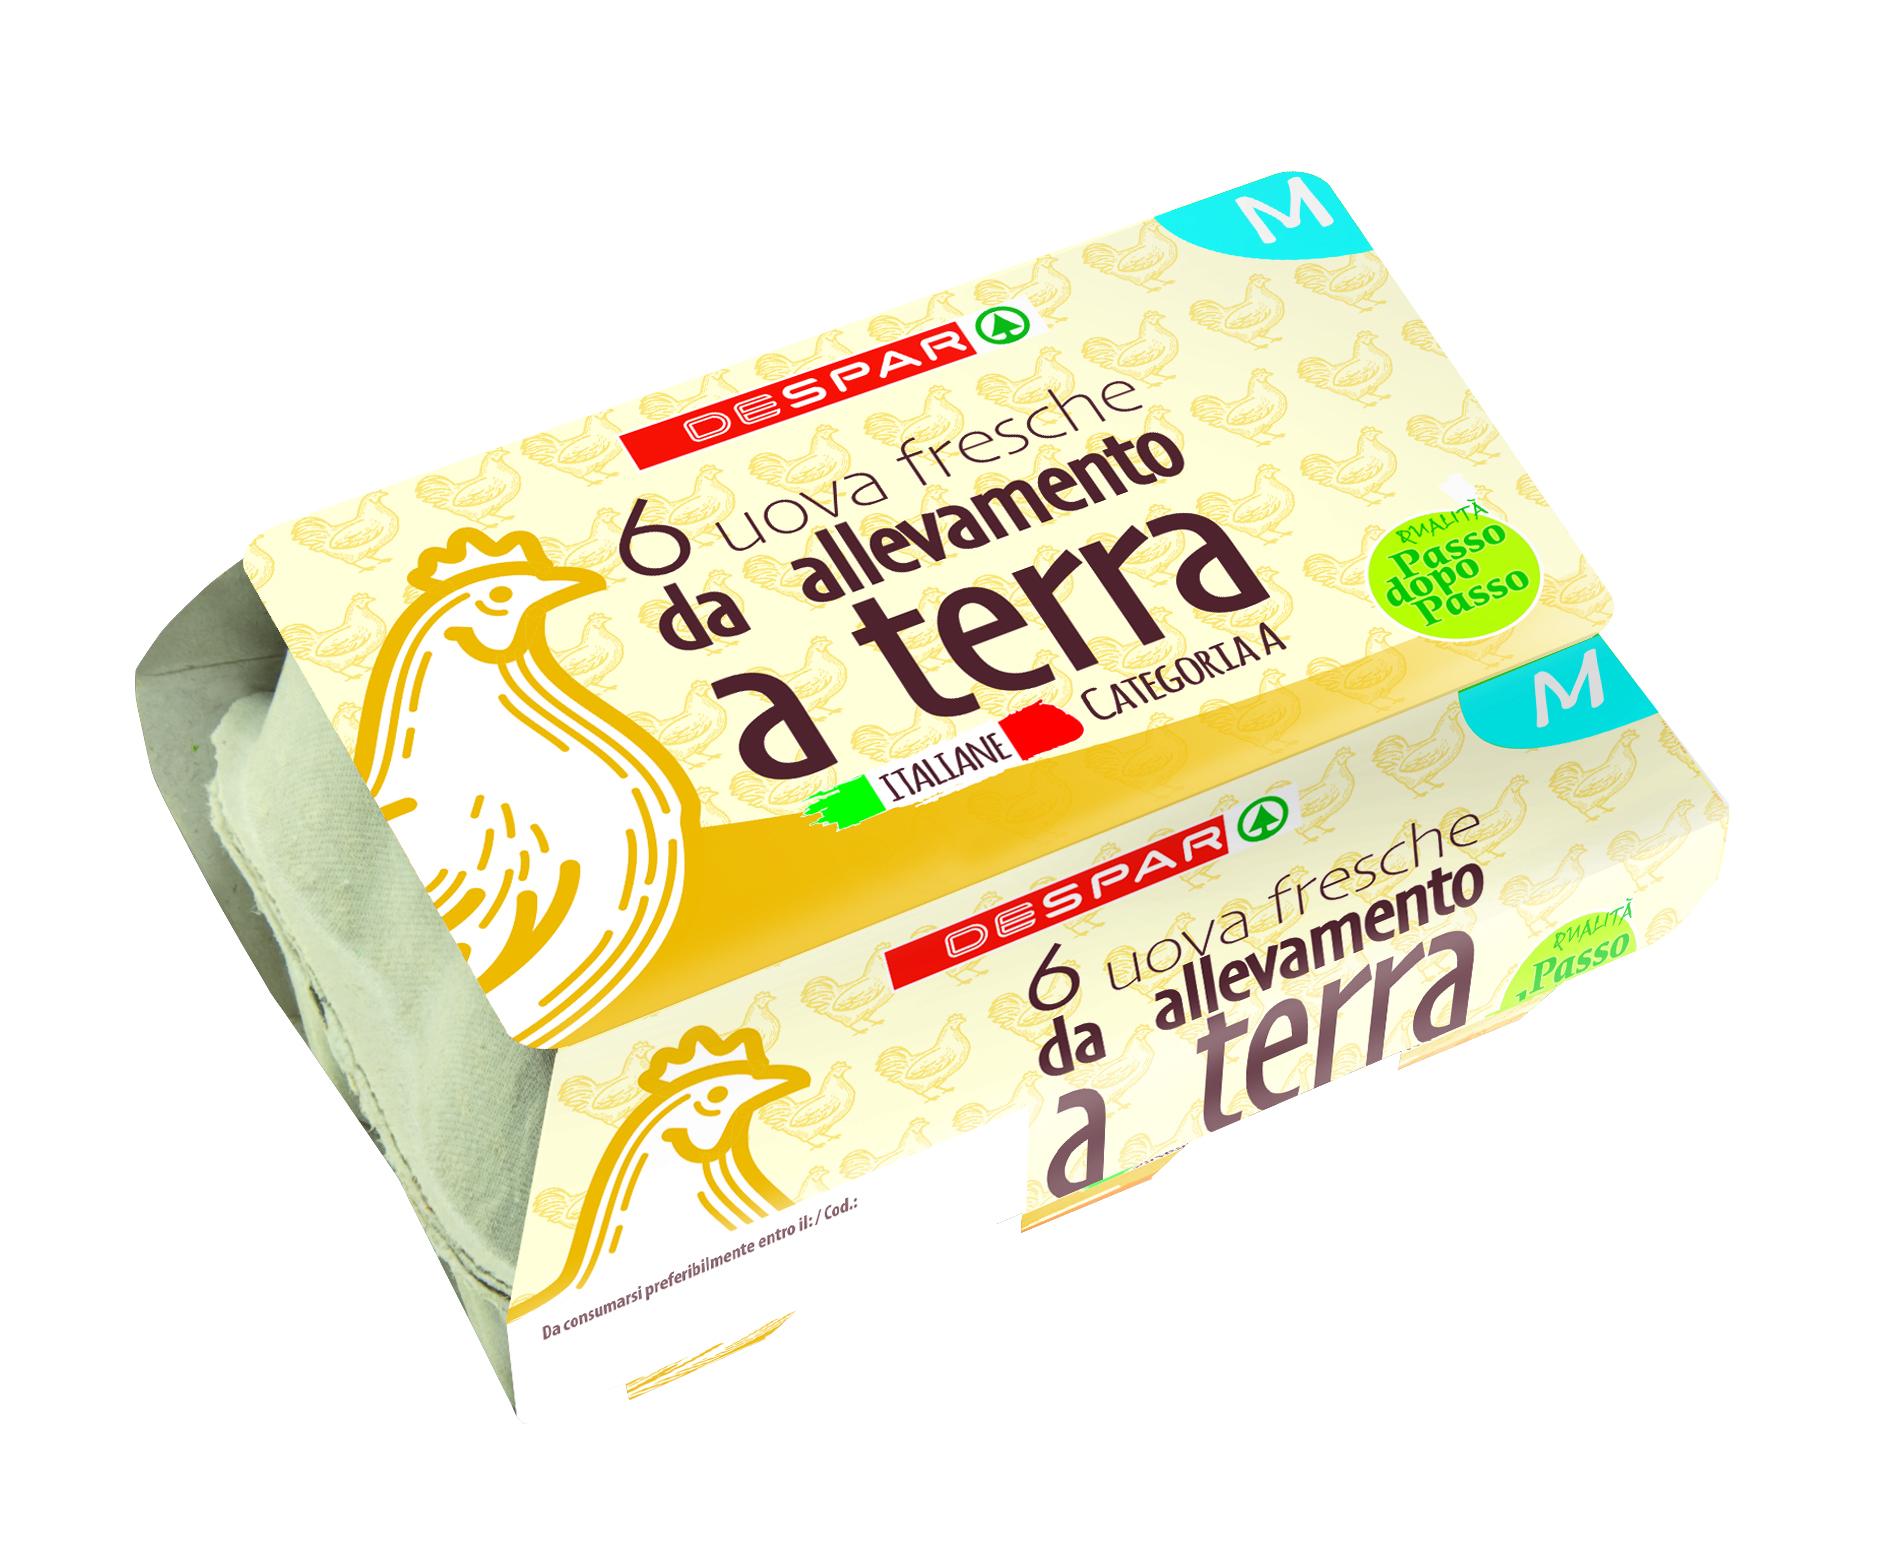 UOVA ALLEVATE A TERRA DESPAR MX6